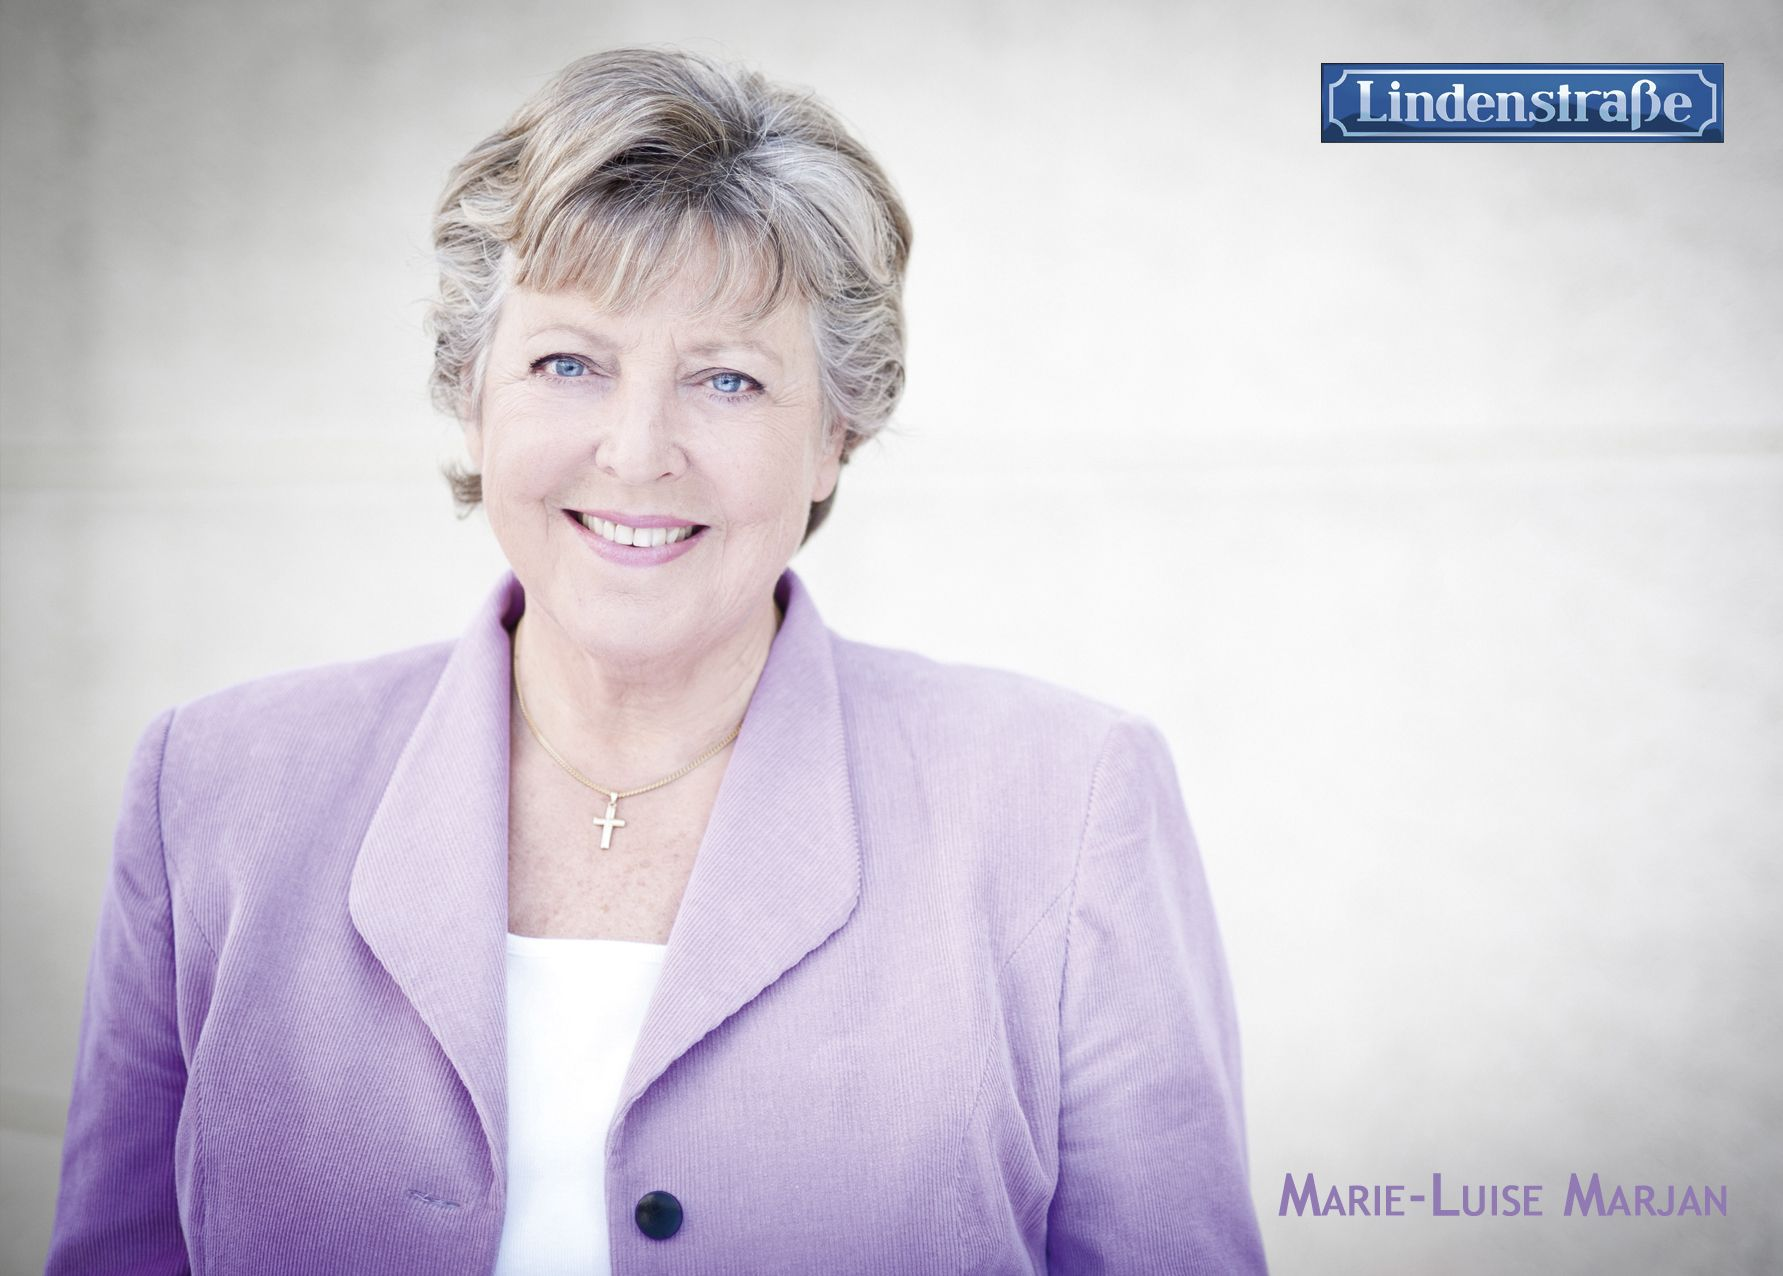 Marie-Luise Marjan spielt Helga Beimer   Reife damen